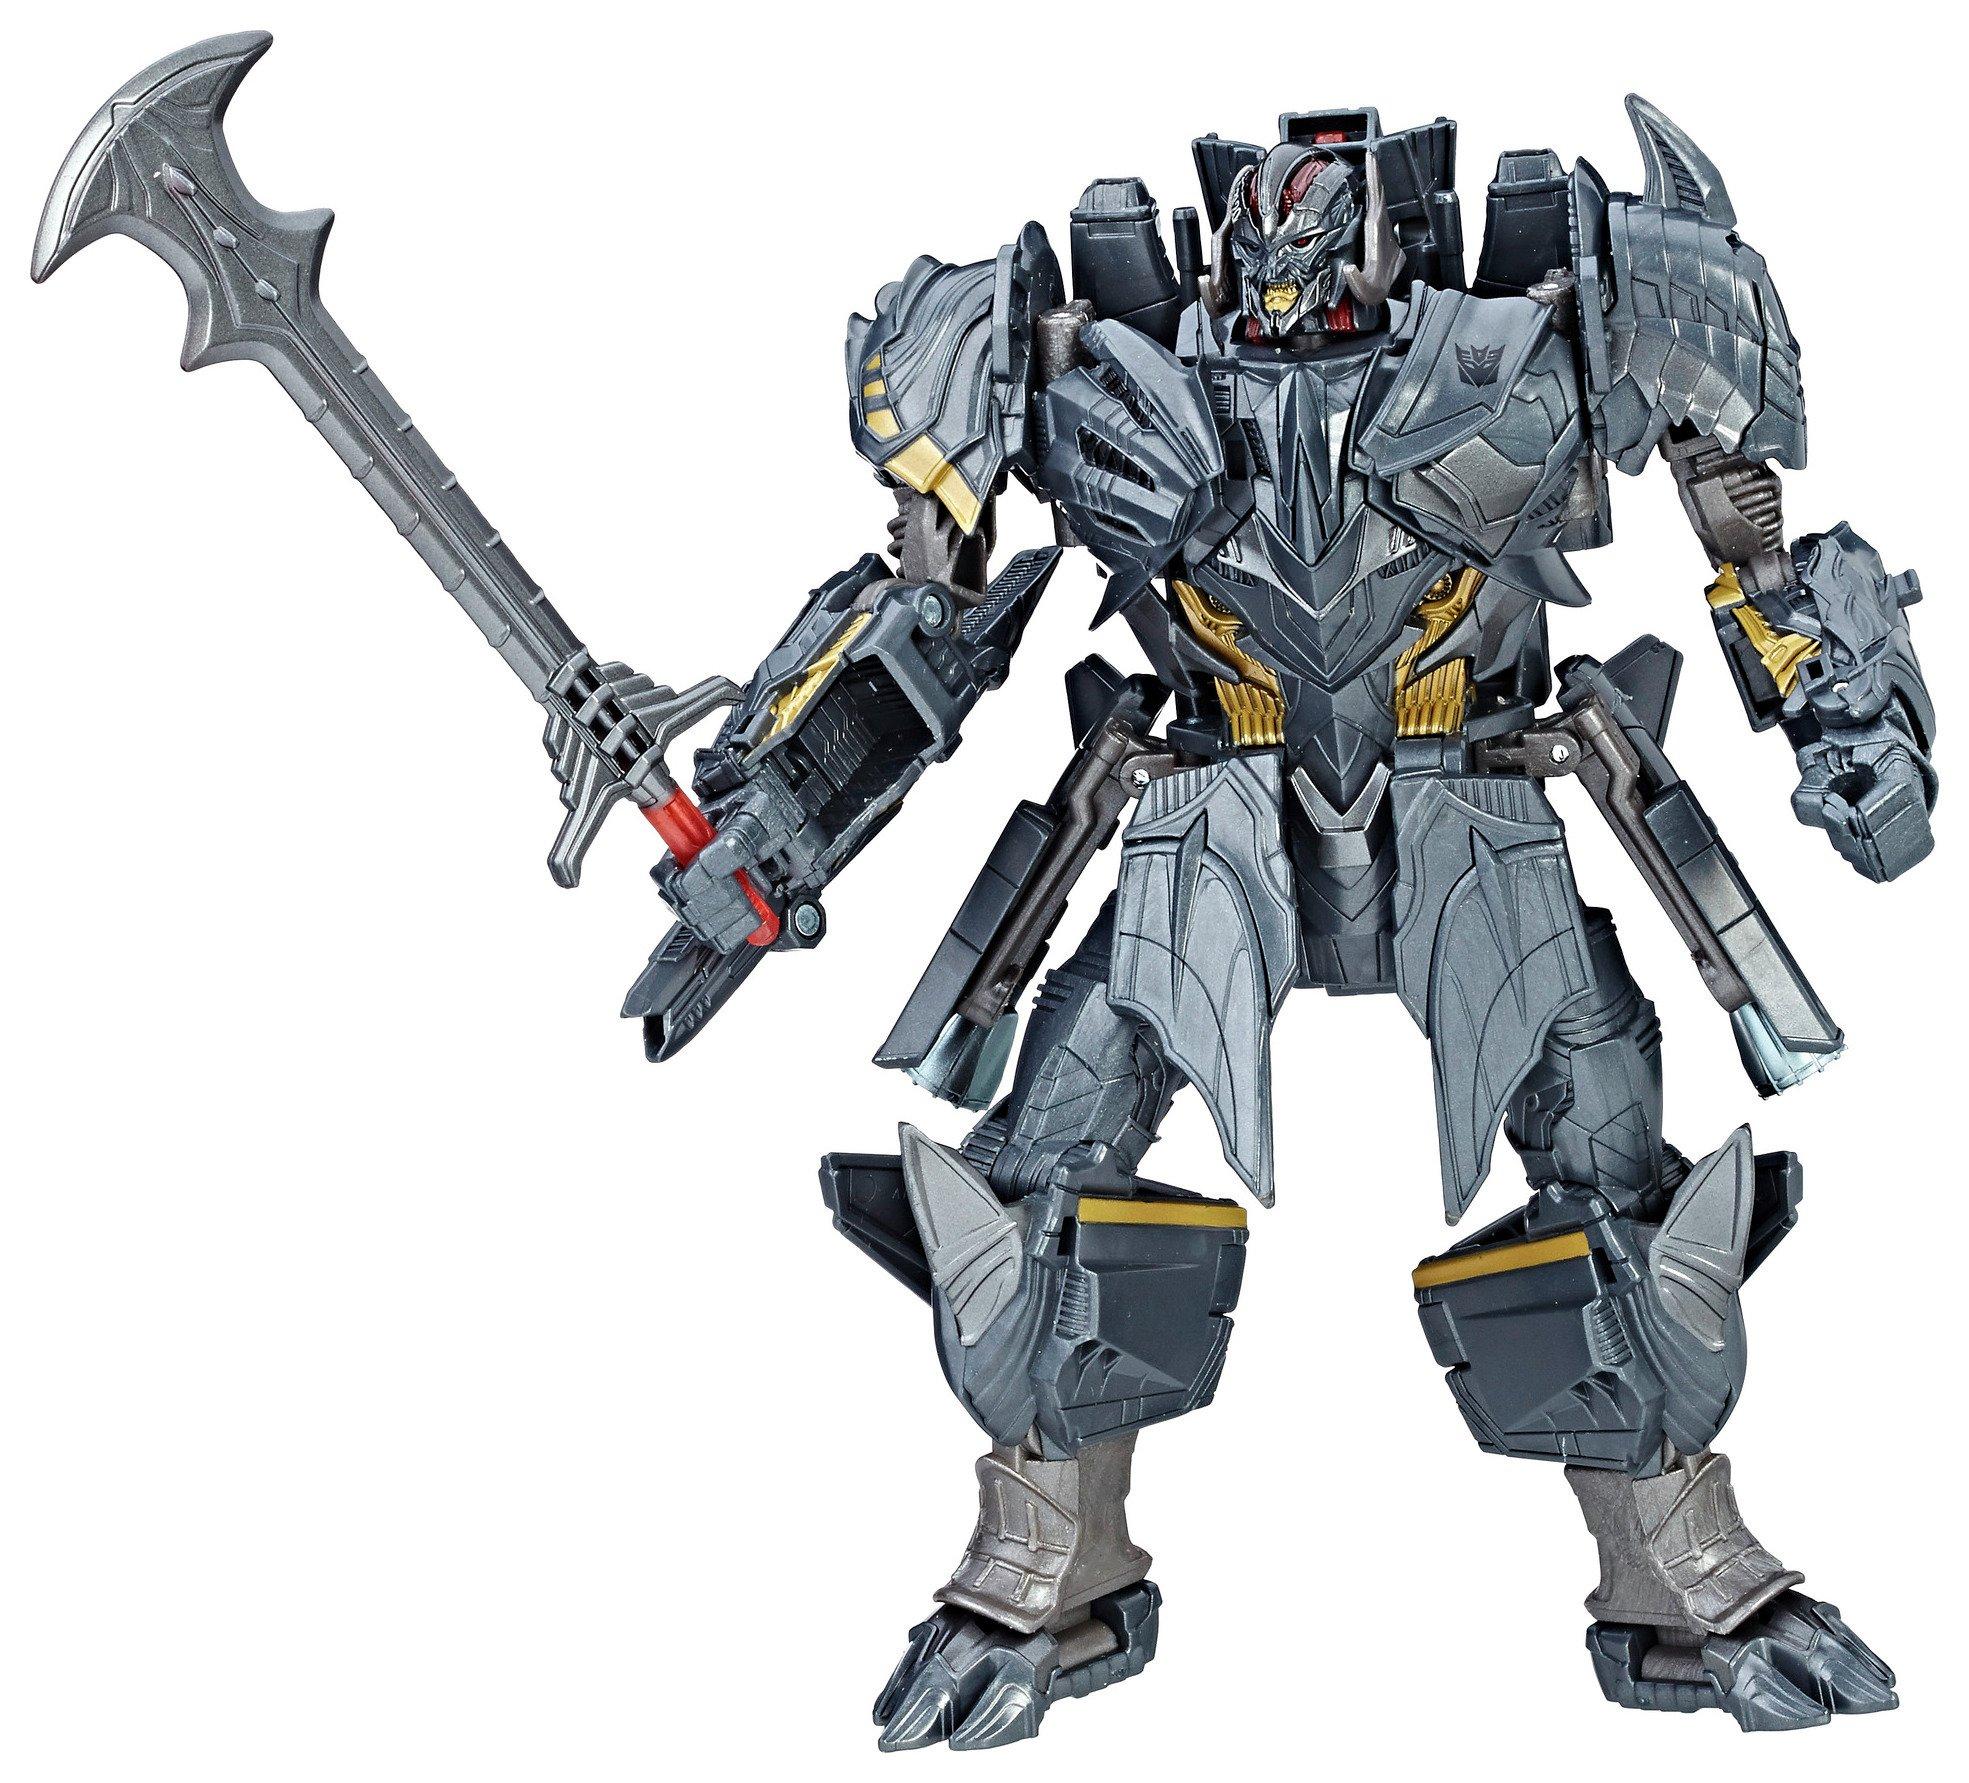 Image of Transformers Premier Edition Voyager Class Megatron